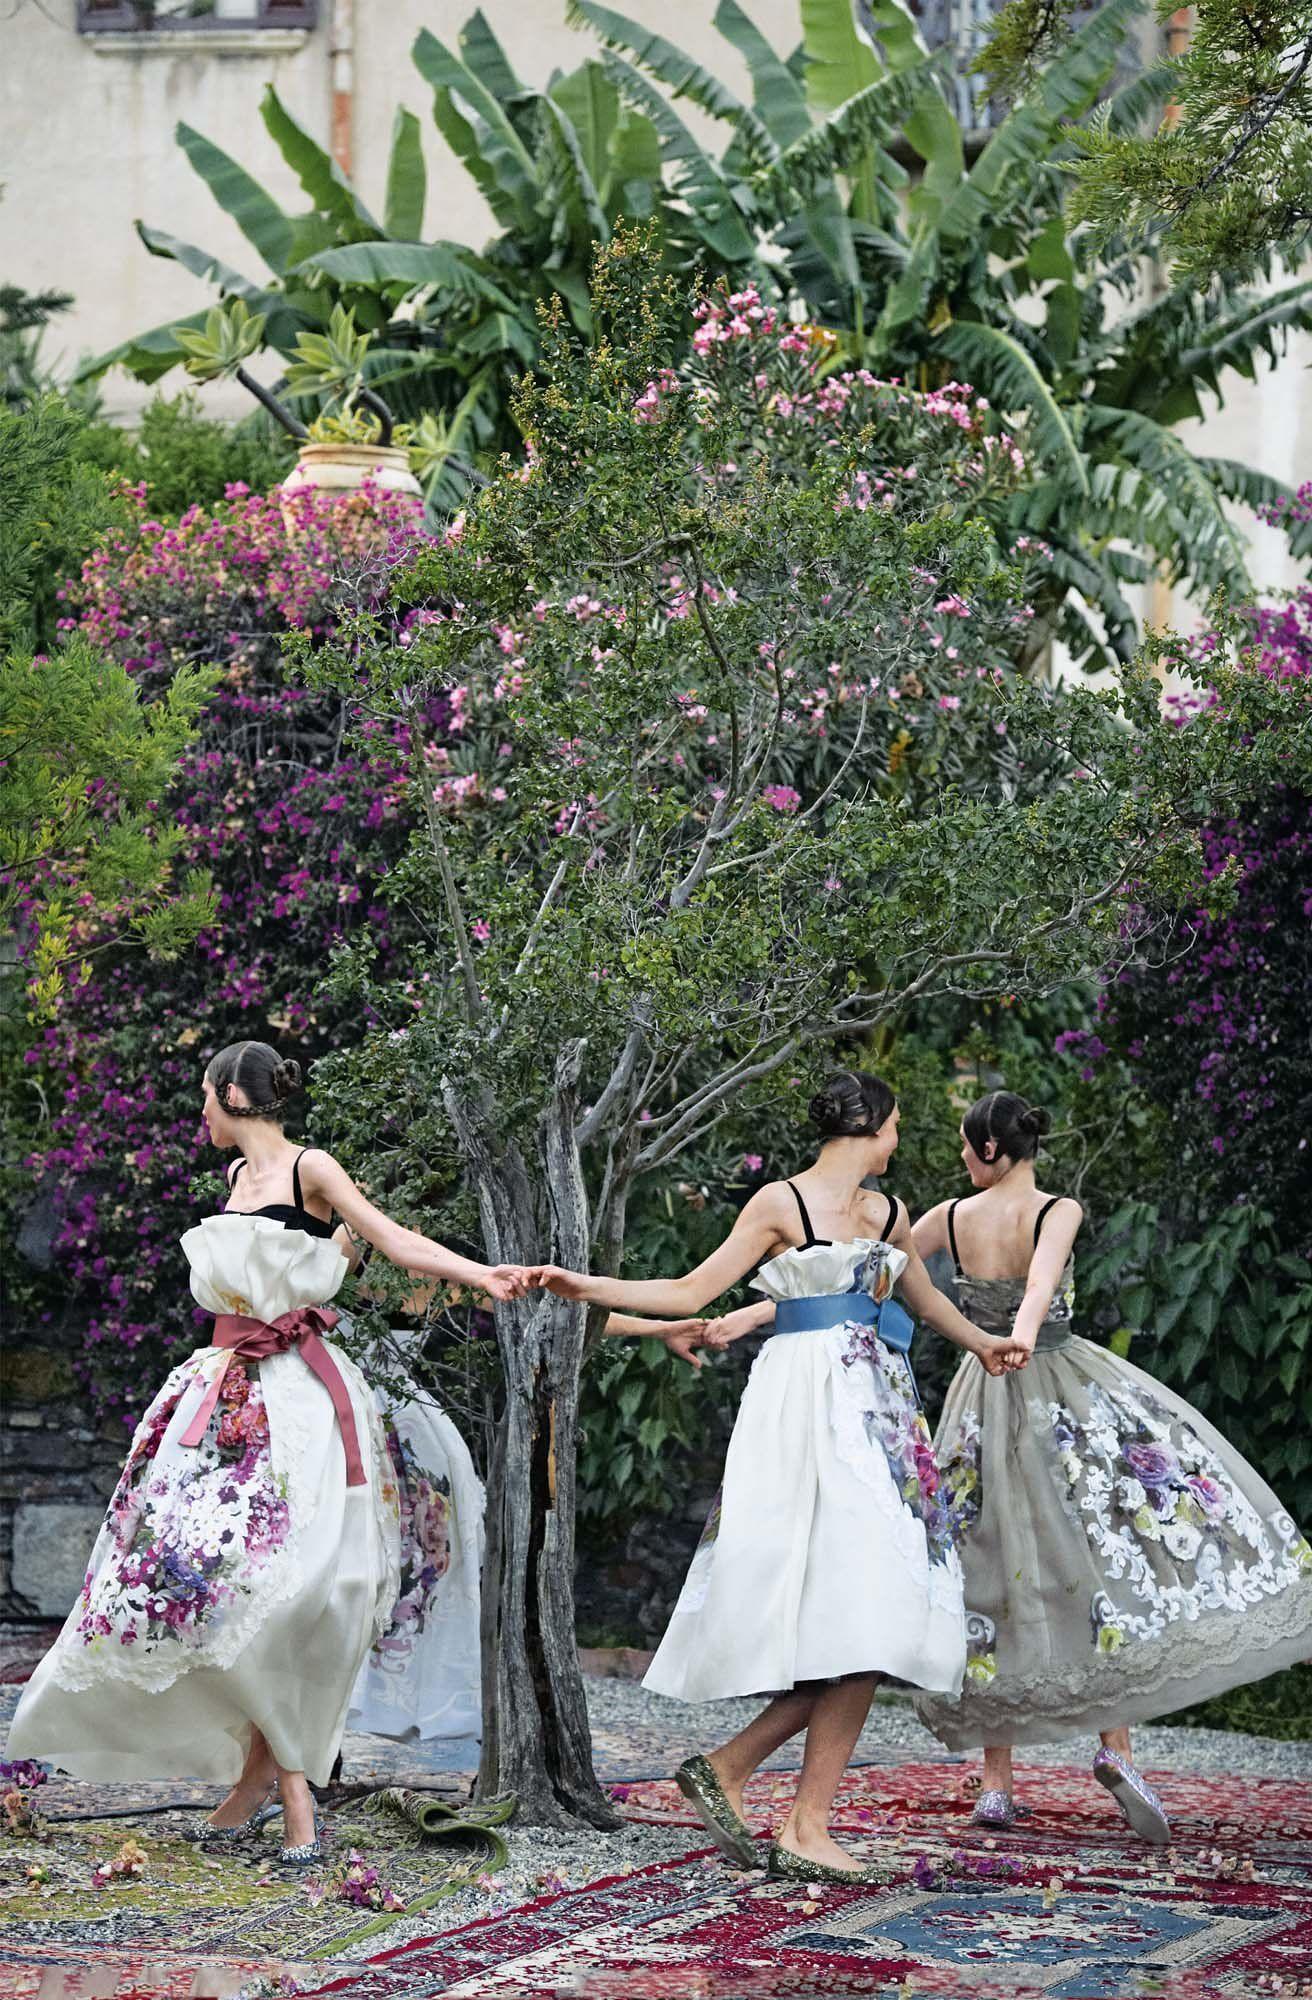 Vogue: Like a Painting - Aymeline Valade, Bette Franke, Elza Luijendijk, and Zuzanna Bijoch, Taormina, Sicily, 2012